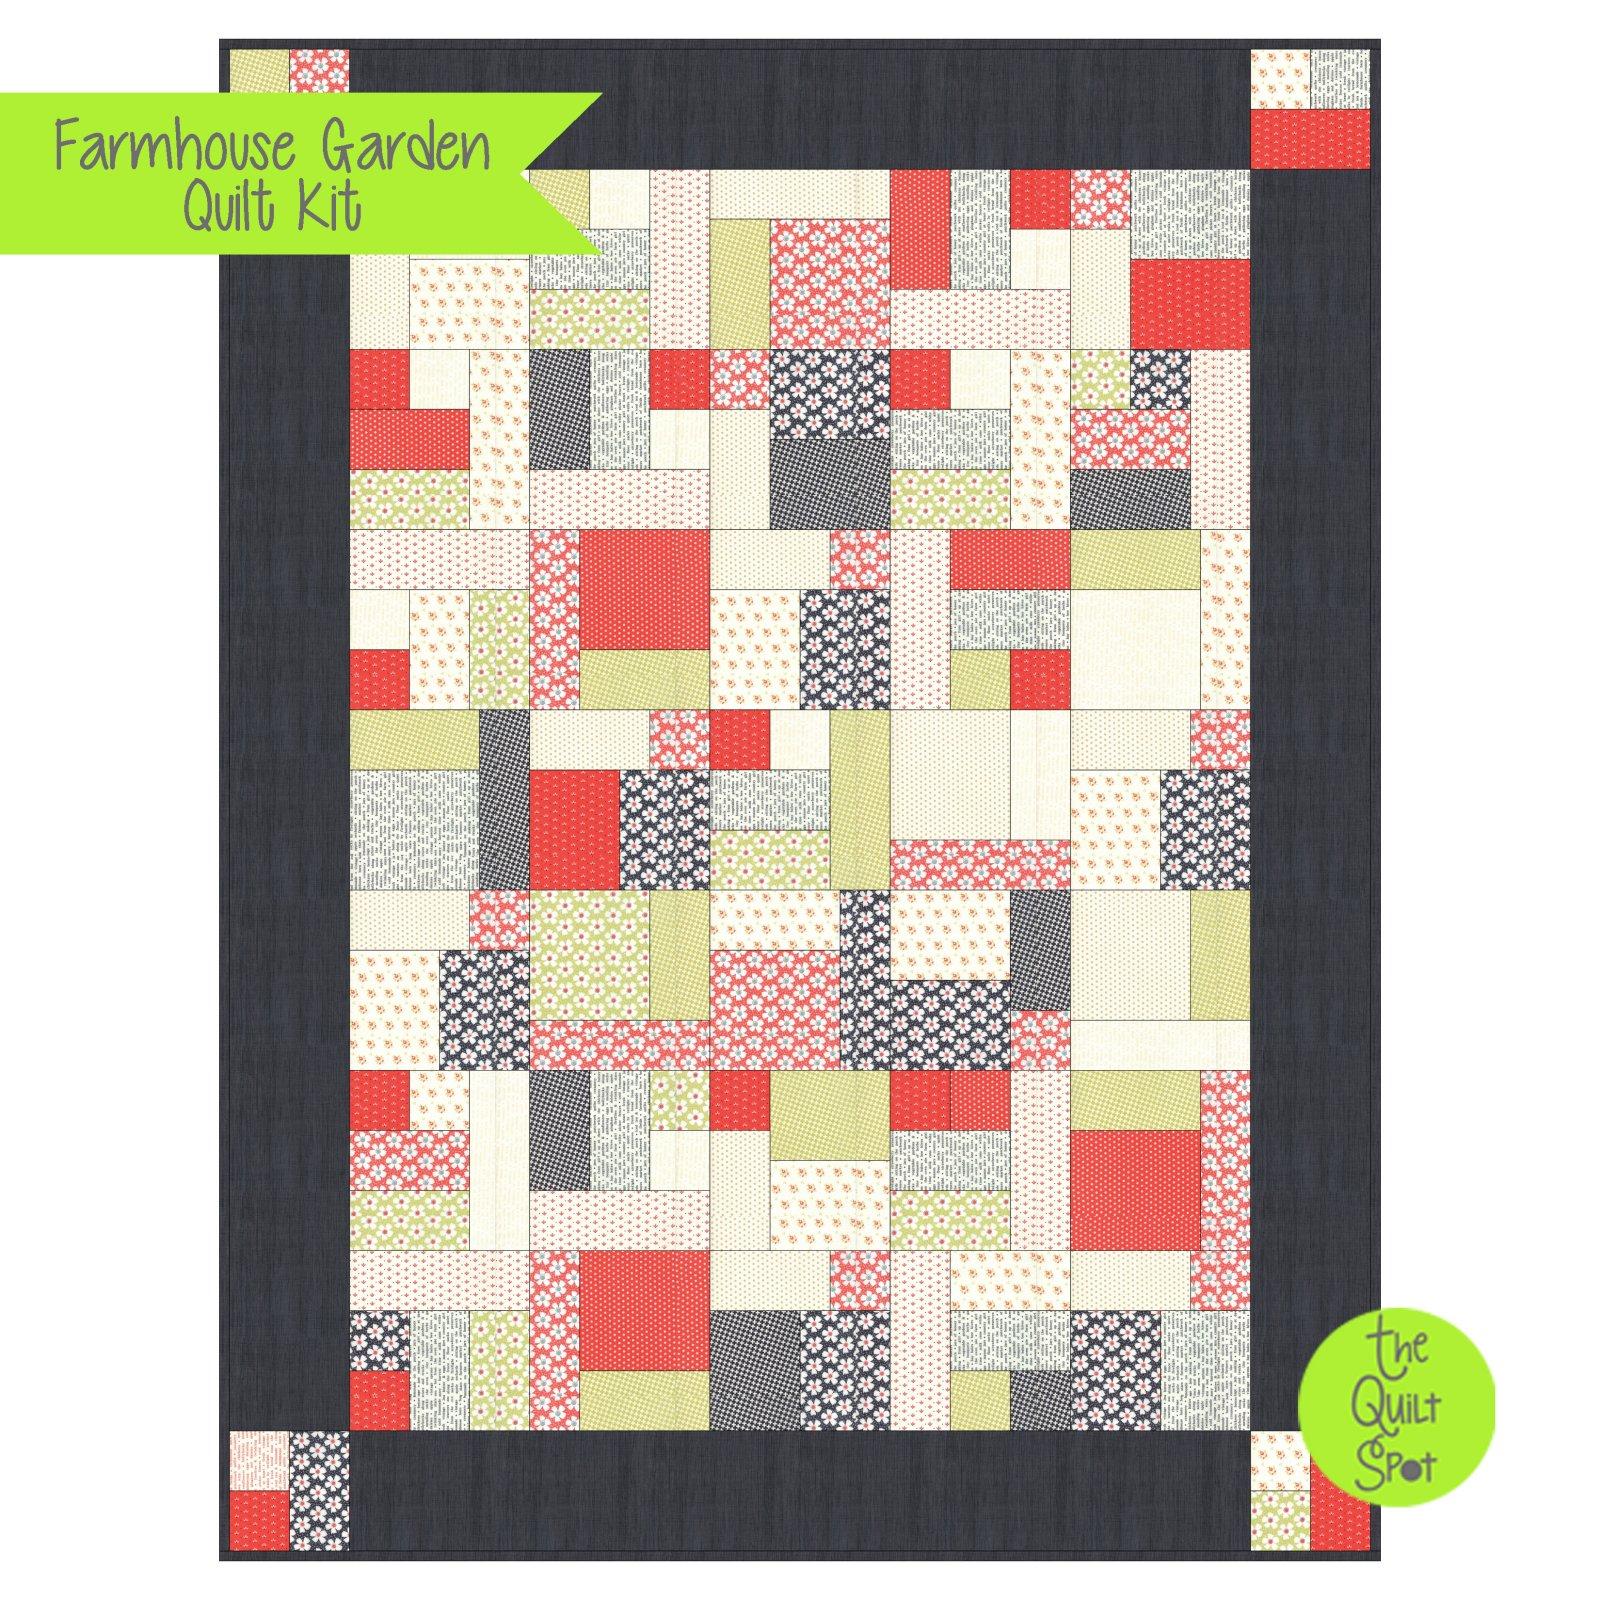 Farmhouse Garden Quilt Kit